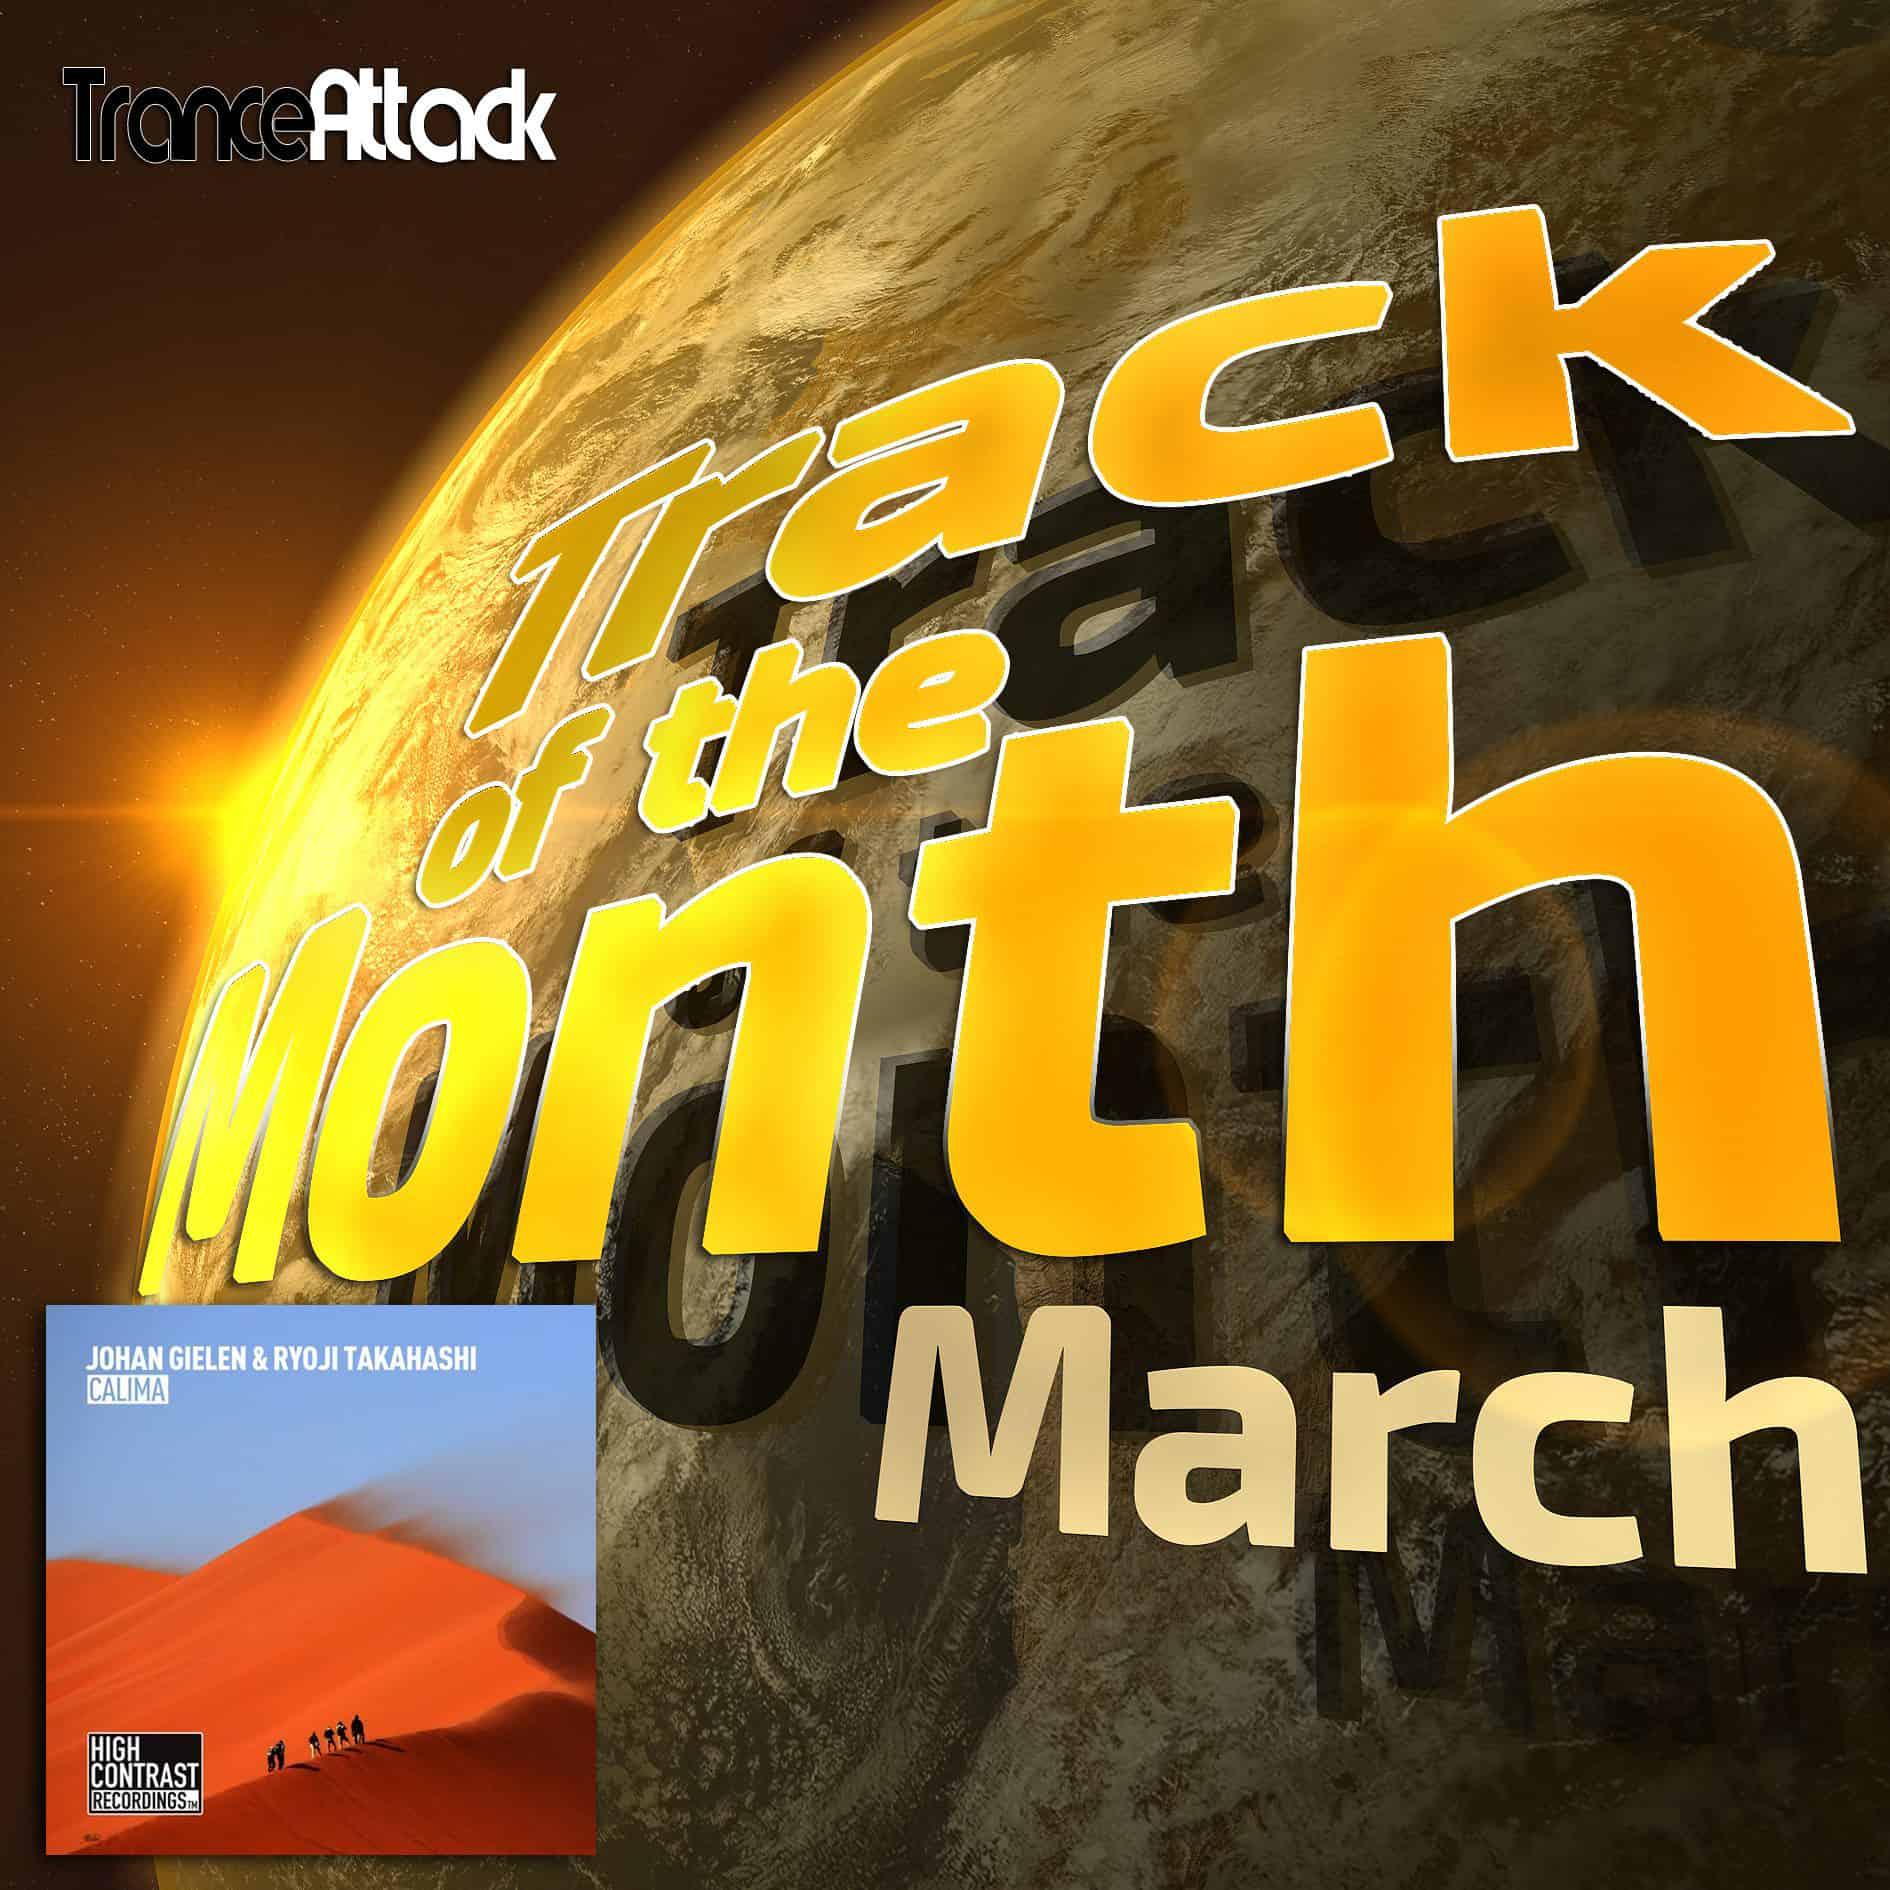 Track Of The Month March 2018: Johan Gielen & Ryoji Takahashi – Calima